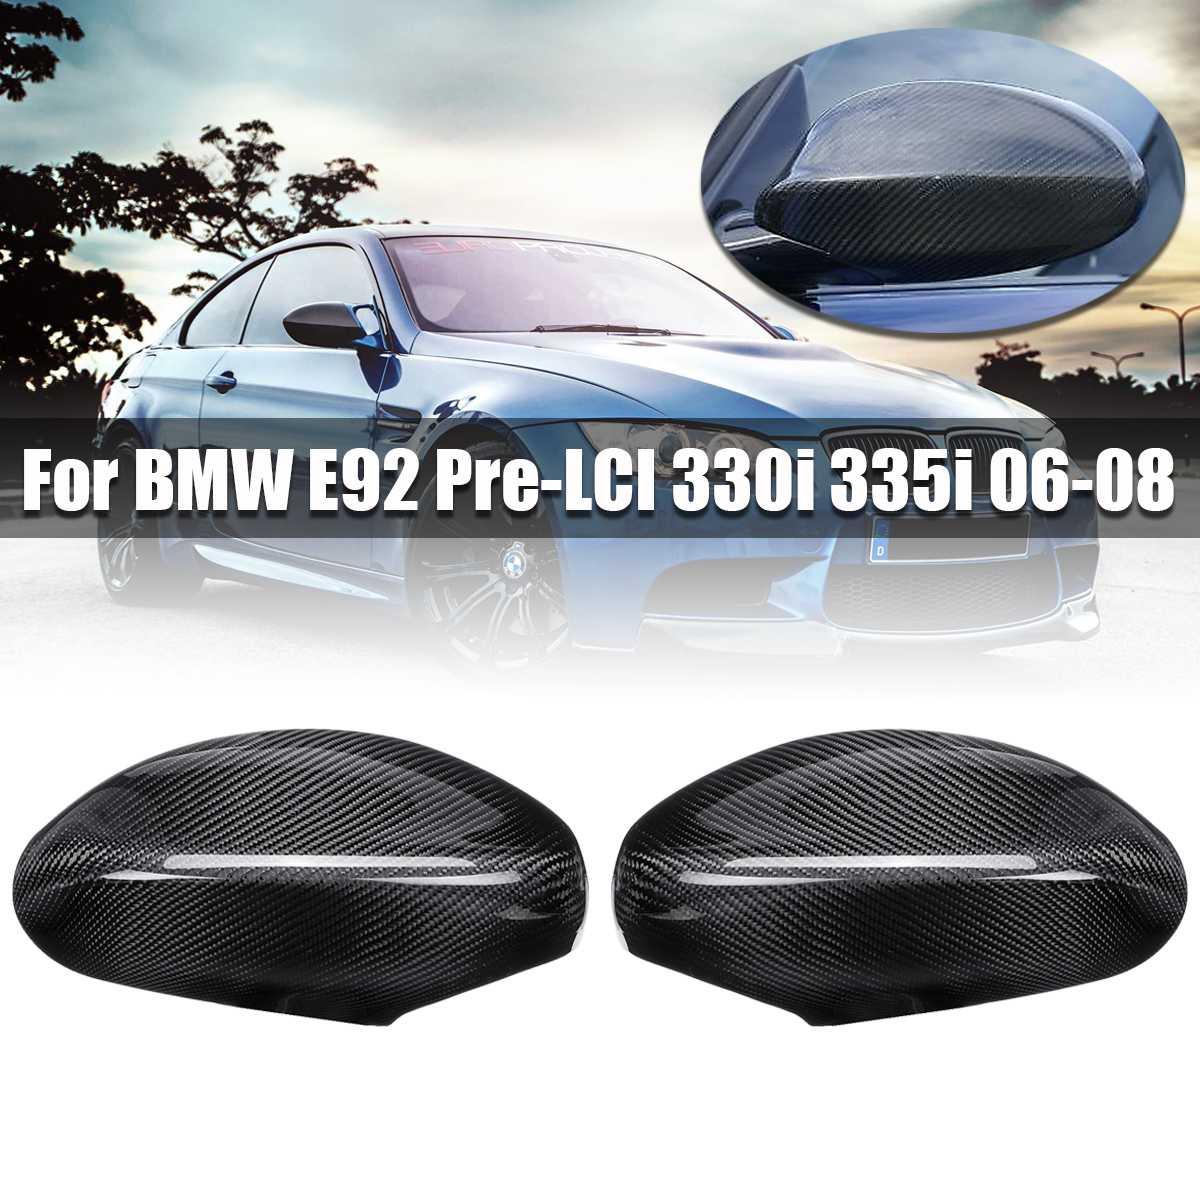 Carbon Fiber Rearview Mirror Cover for BMW E92 Pre LCI 330i 335i 06 08 Auto Exterior Accessories Door Side Mirror Cover for BMW